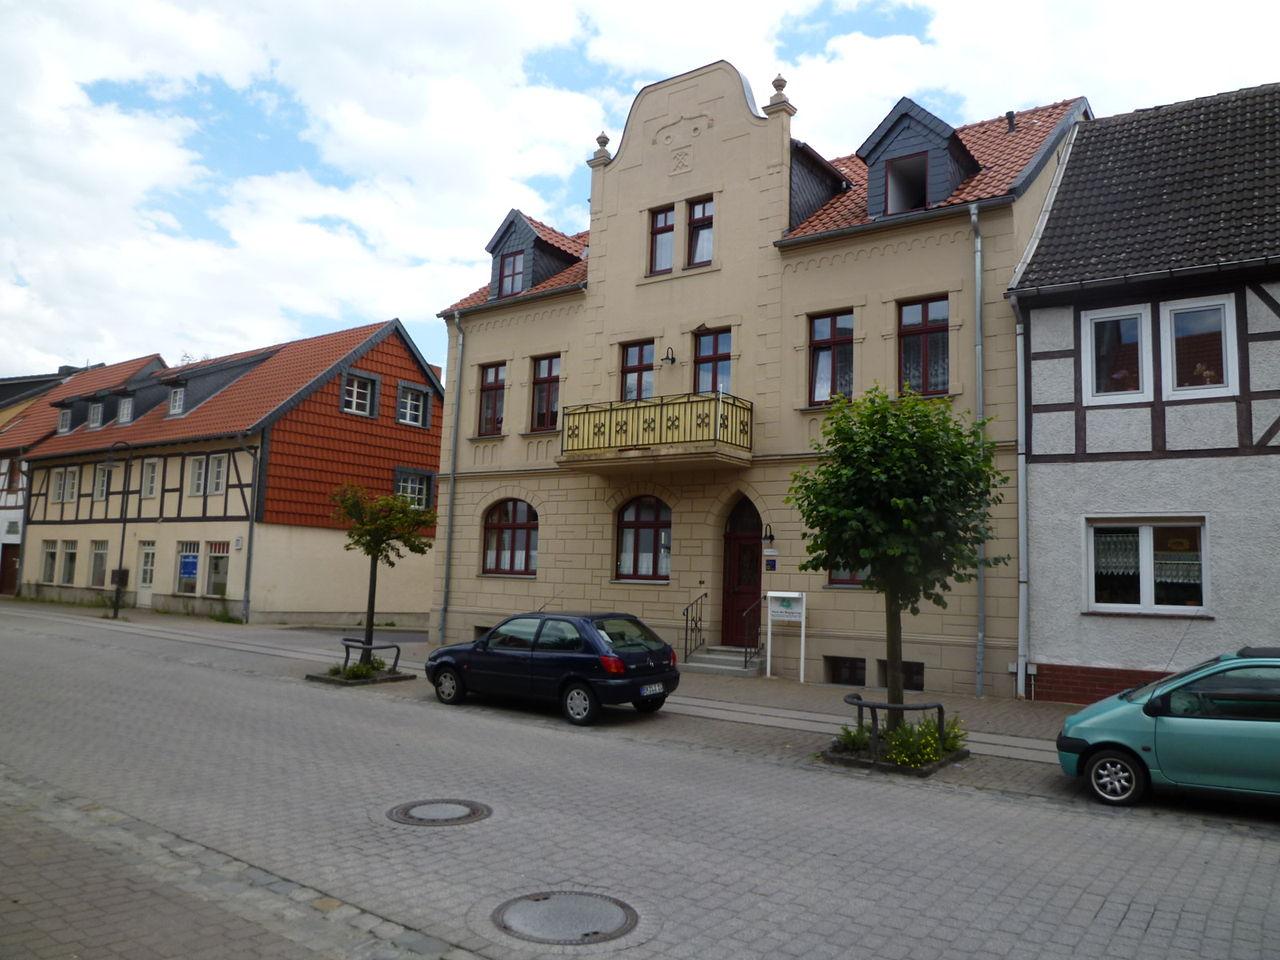 File Calvörde Haus der Begegnung b 2011 JPG Wikimedia